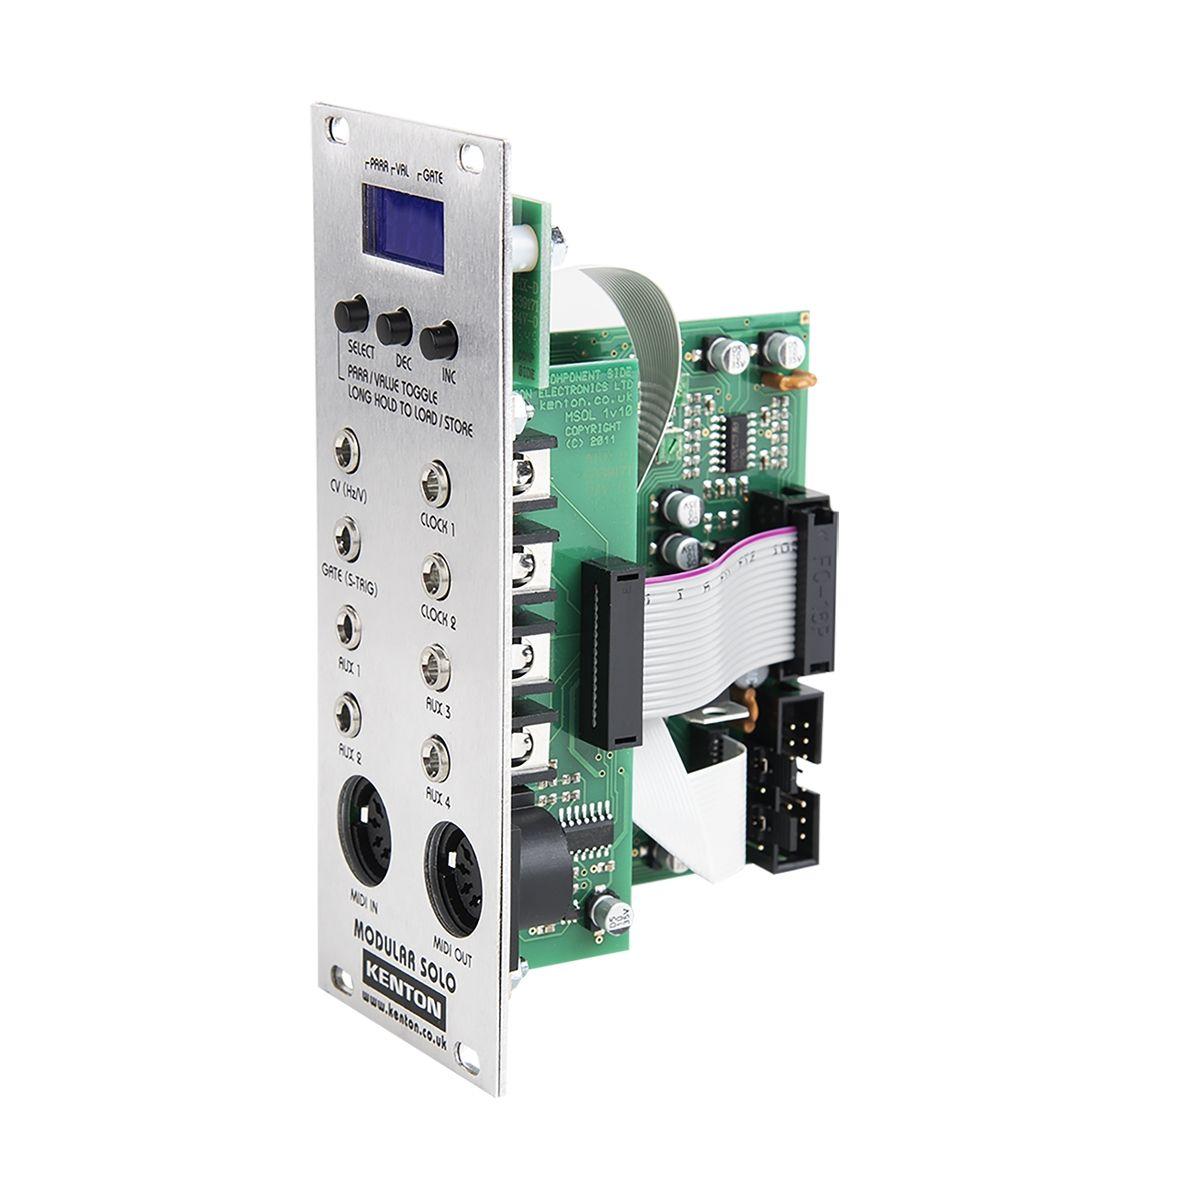 Kenton ElectronicsModular Solo Eurorack MIDI to CV Module